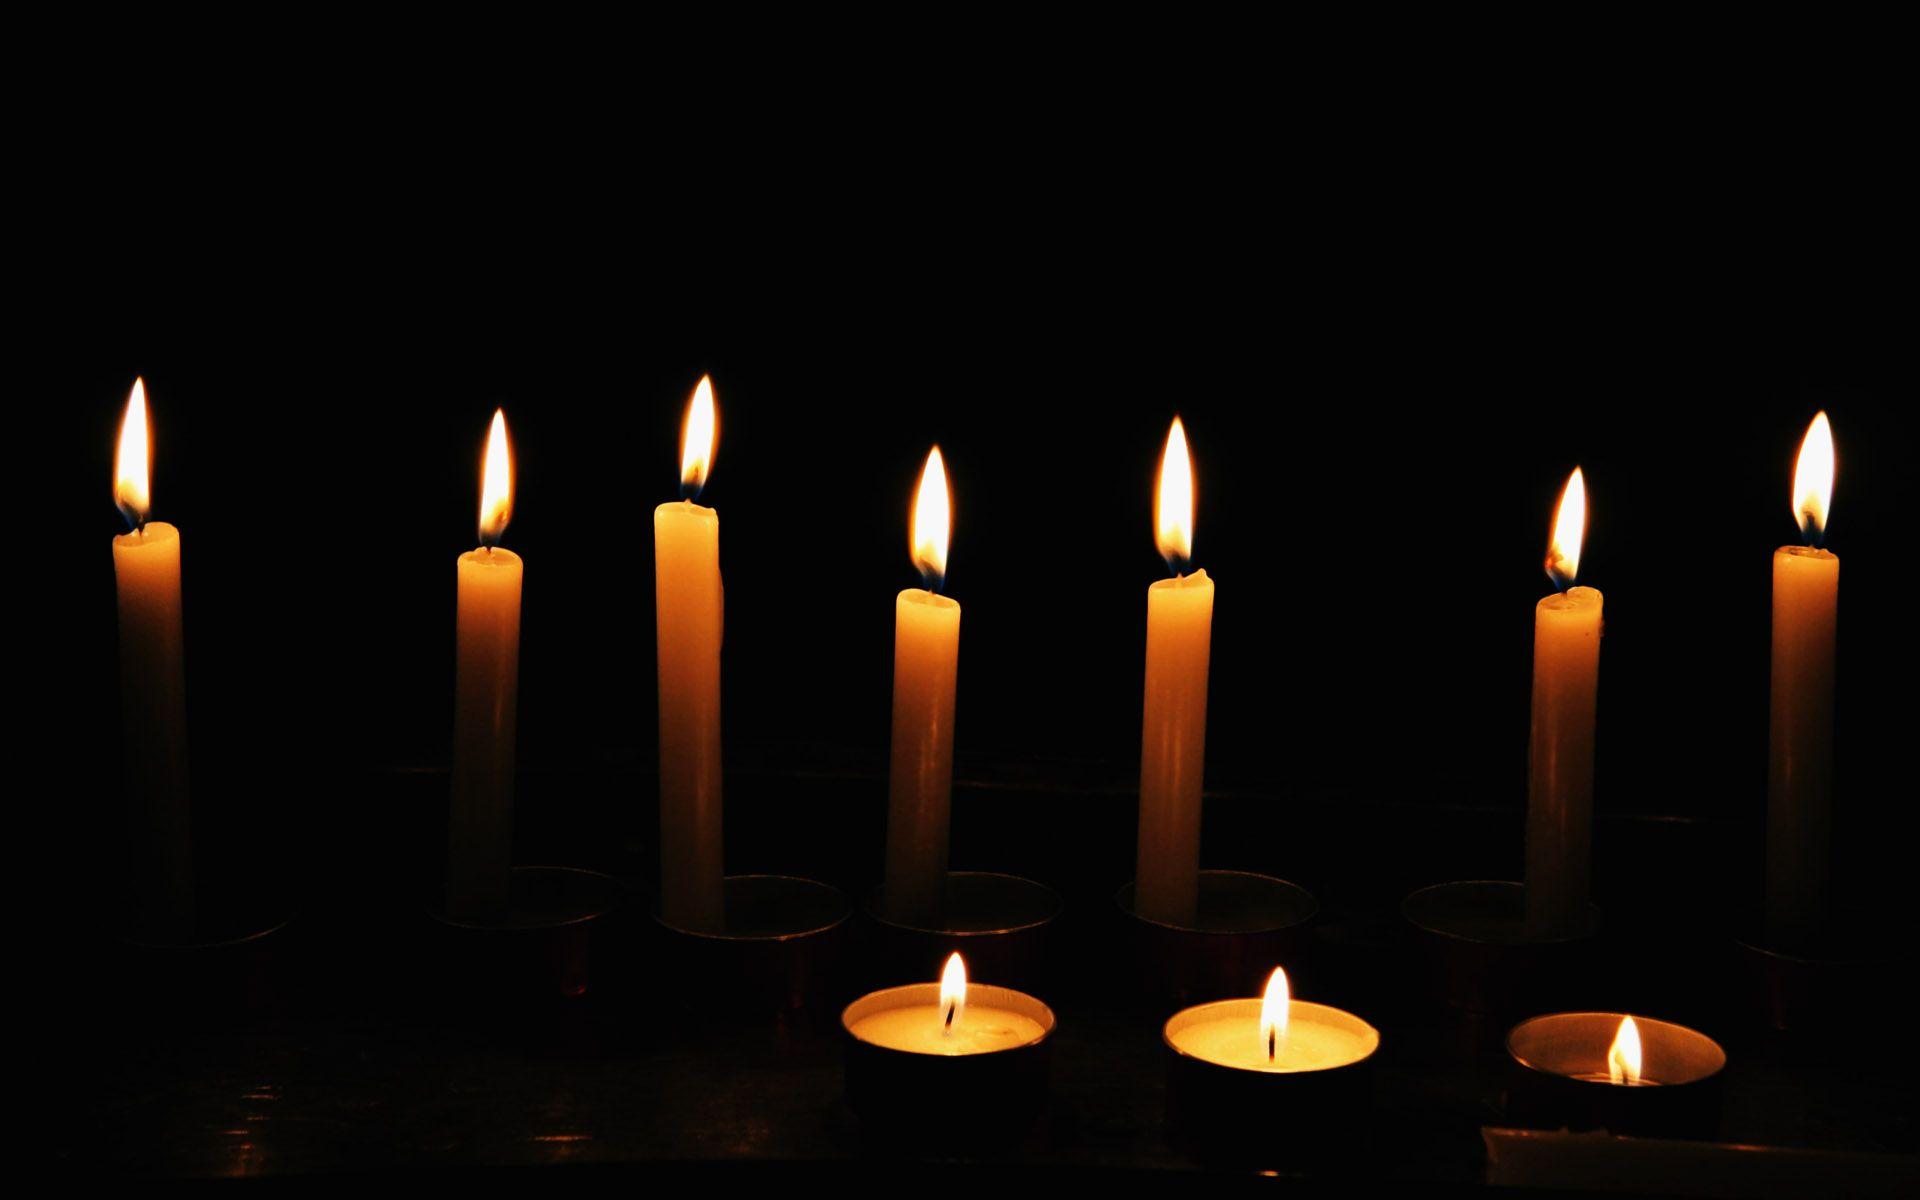 photos of candles burning